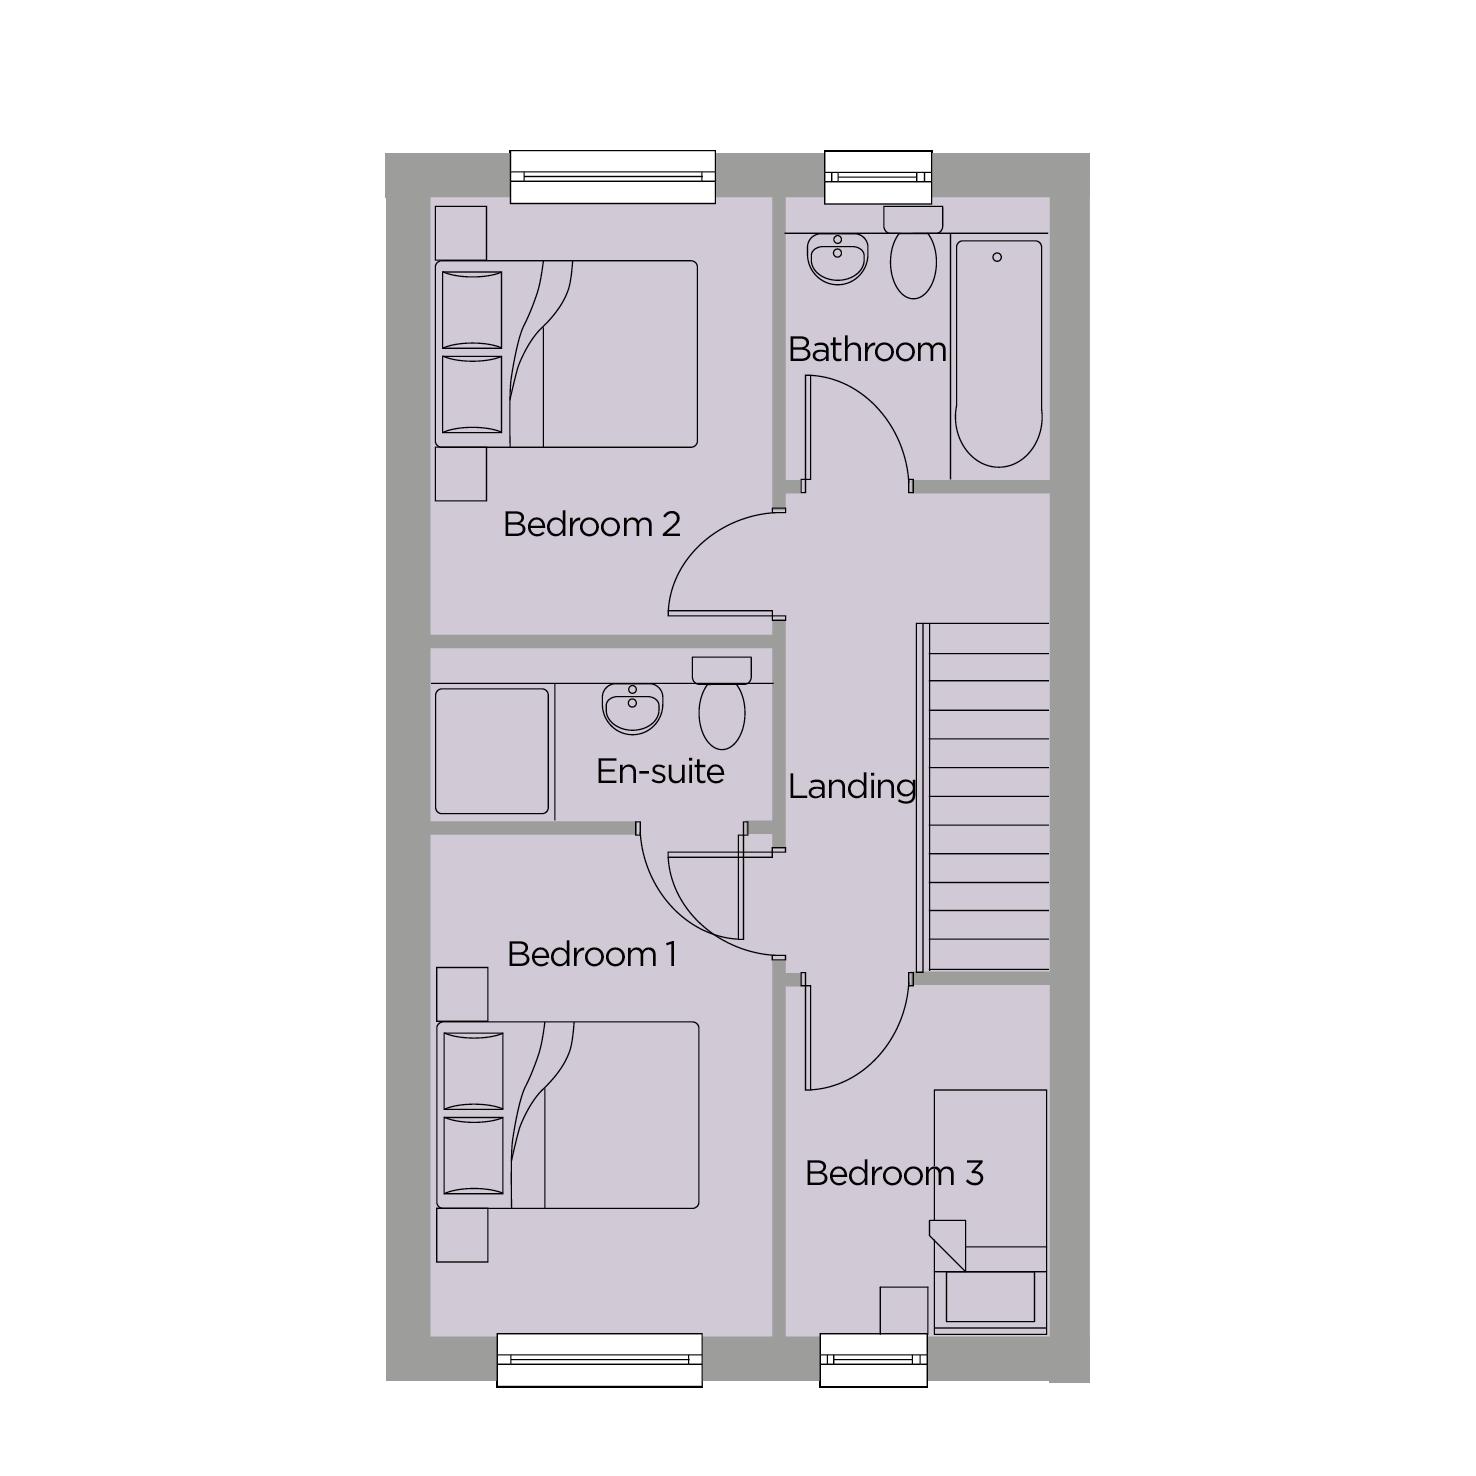 meadow_view_floorplans_the_elm_2.png